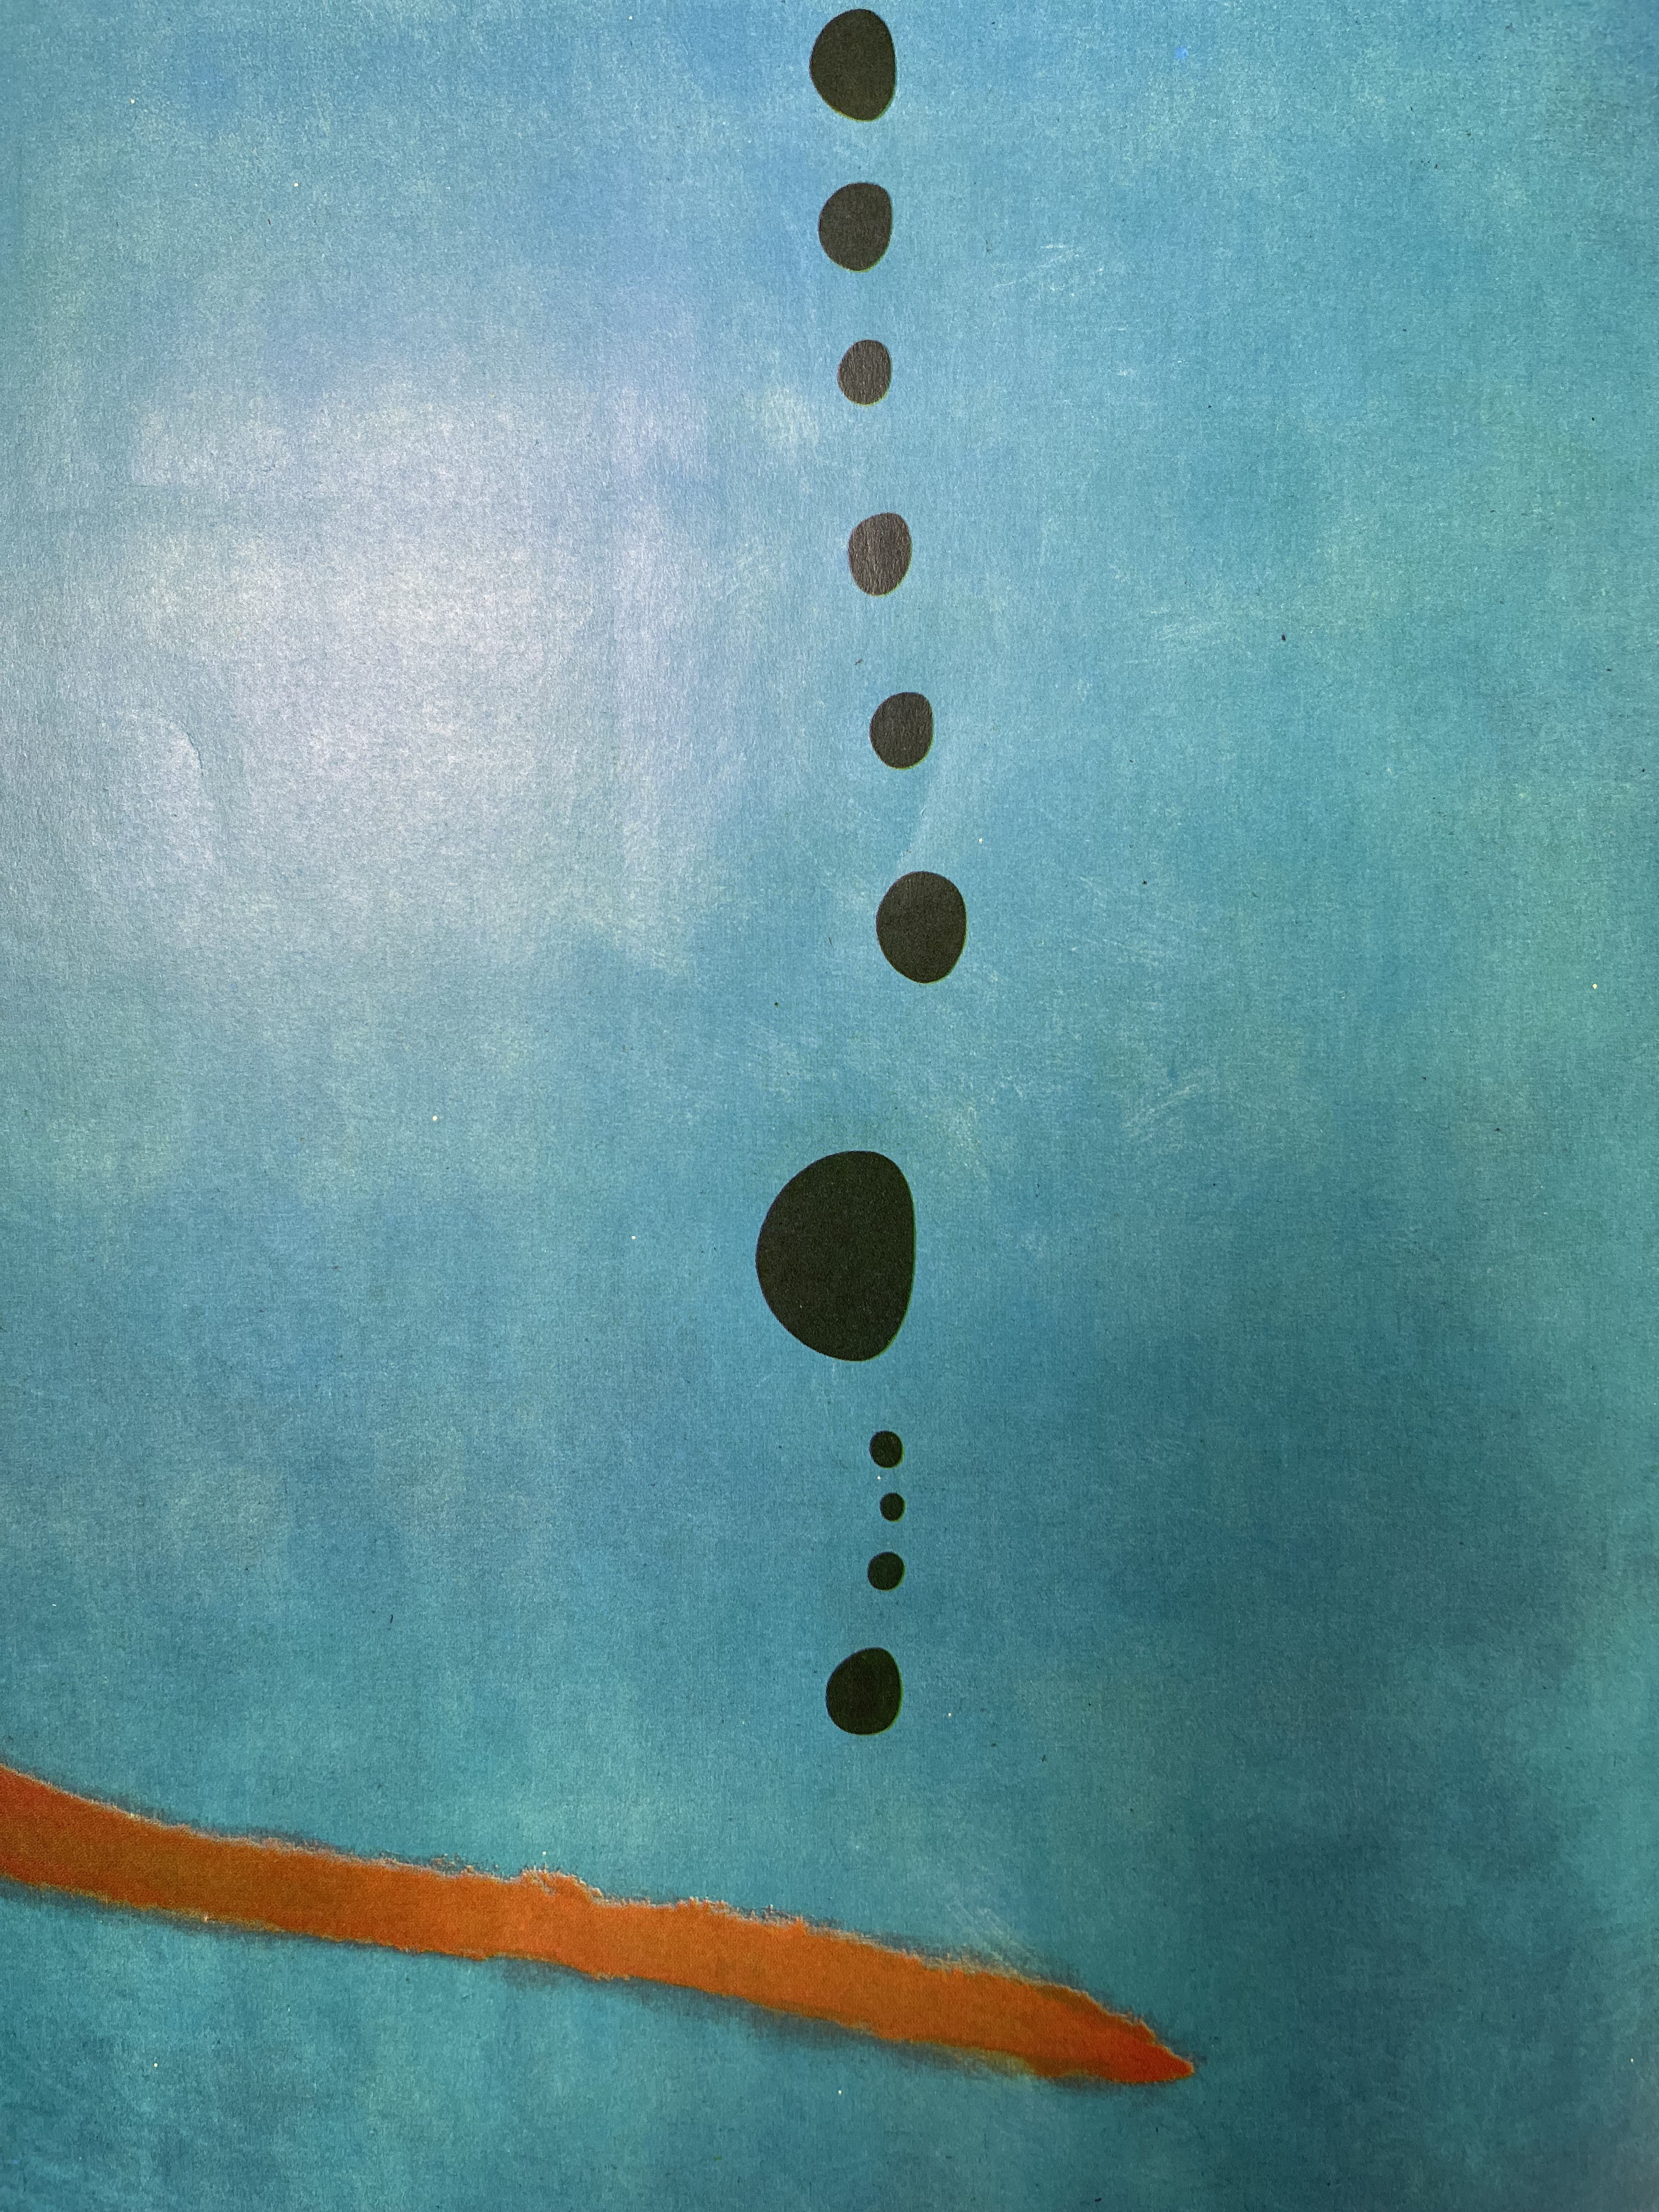 Alexander Calder/Miro Print - age6+